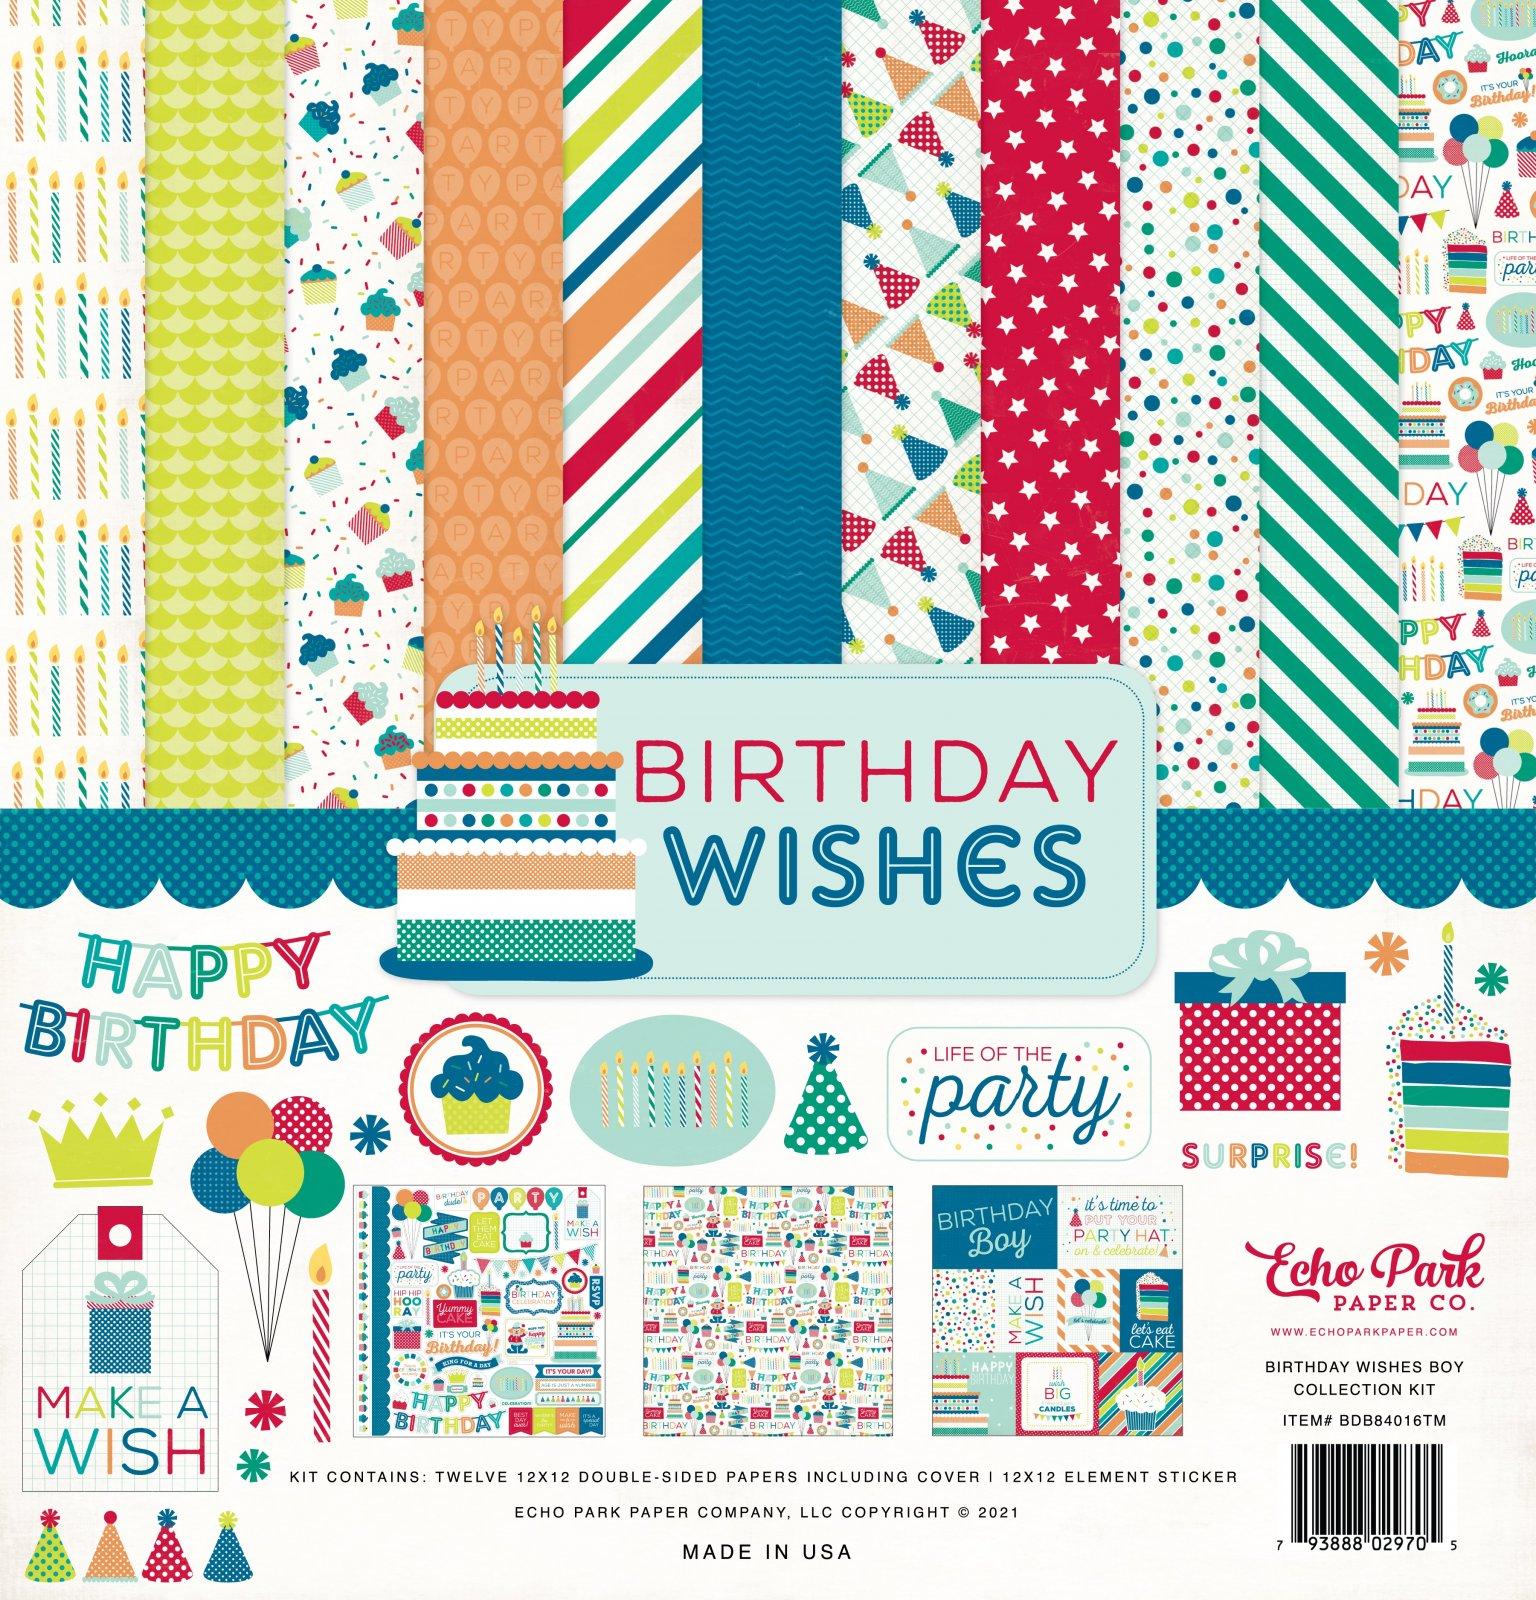 Echo Park Collection Kit 12x12 - Birthday Wishes Boy